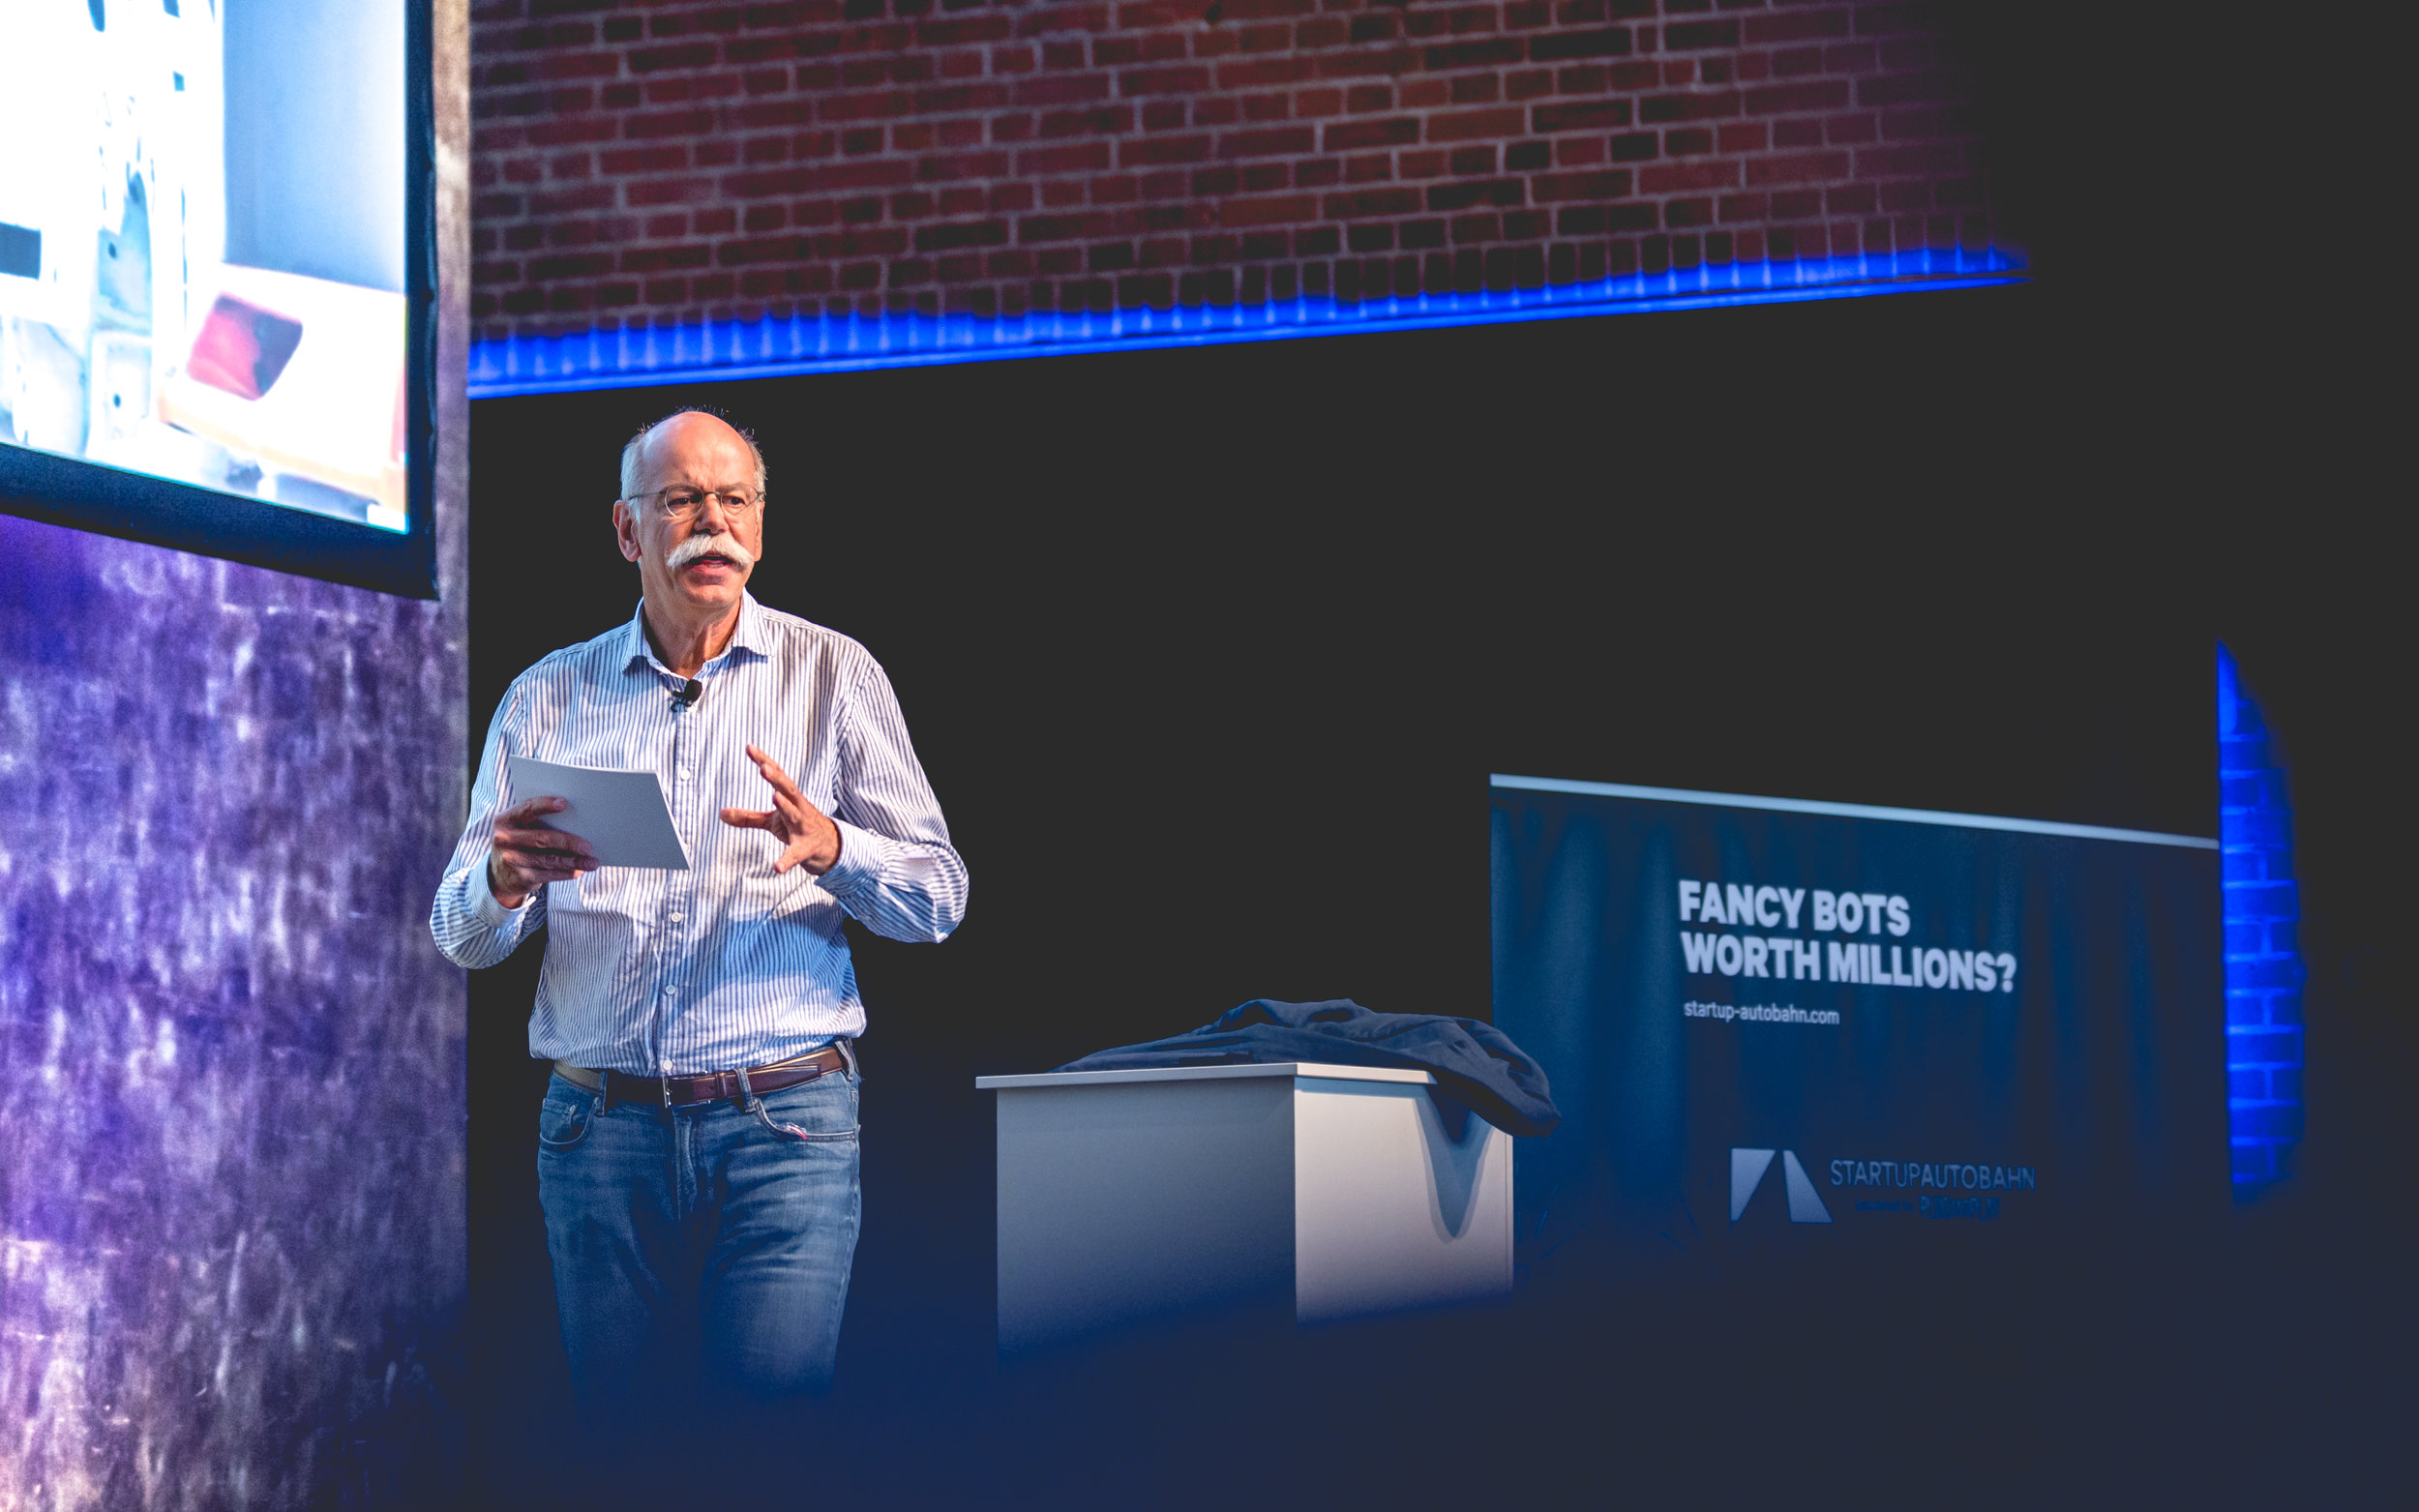 Dieter Zetsche - chairman of Daimler and Head of Mercedes-Benz - launches Startup Autobahn in Stuttgart.